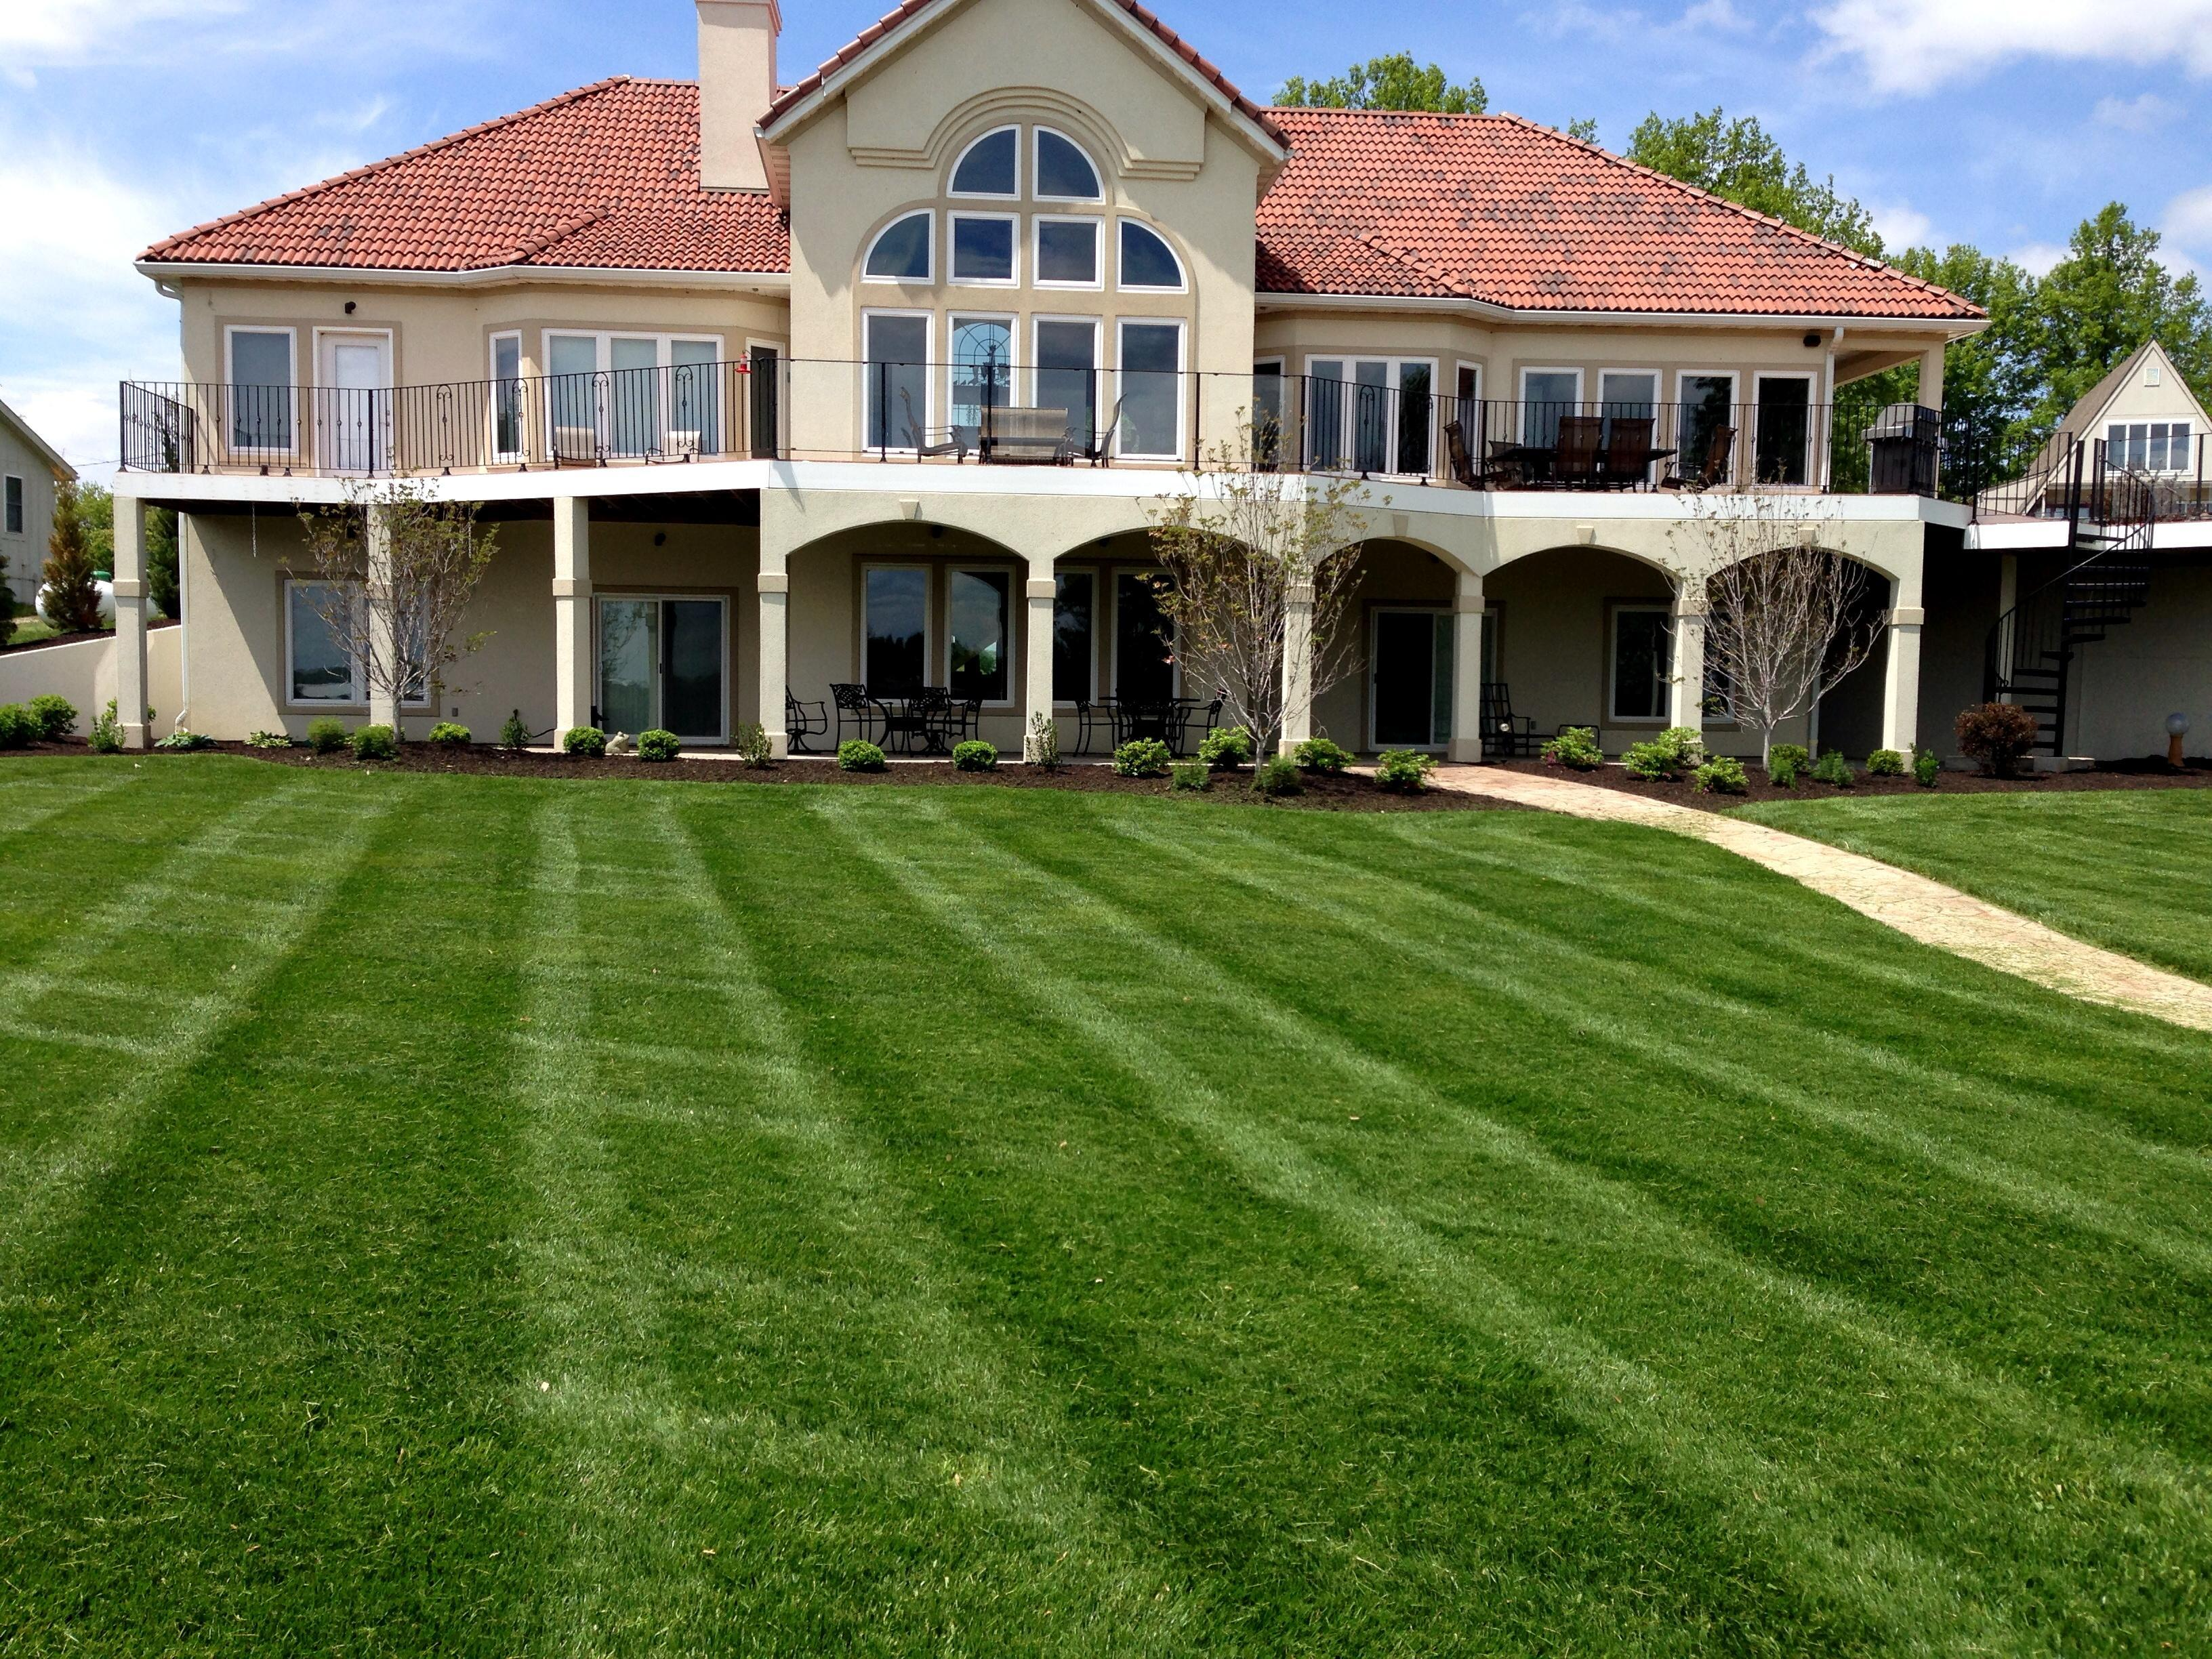 Bradford Street Lawn & Landscaping, LLC image 0